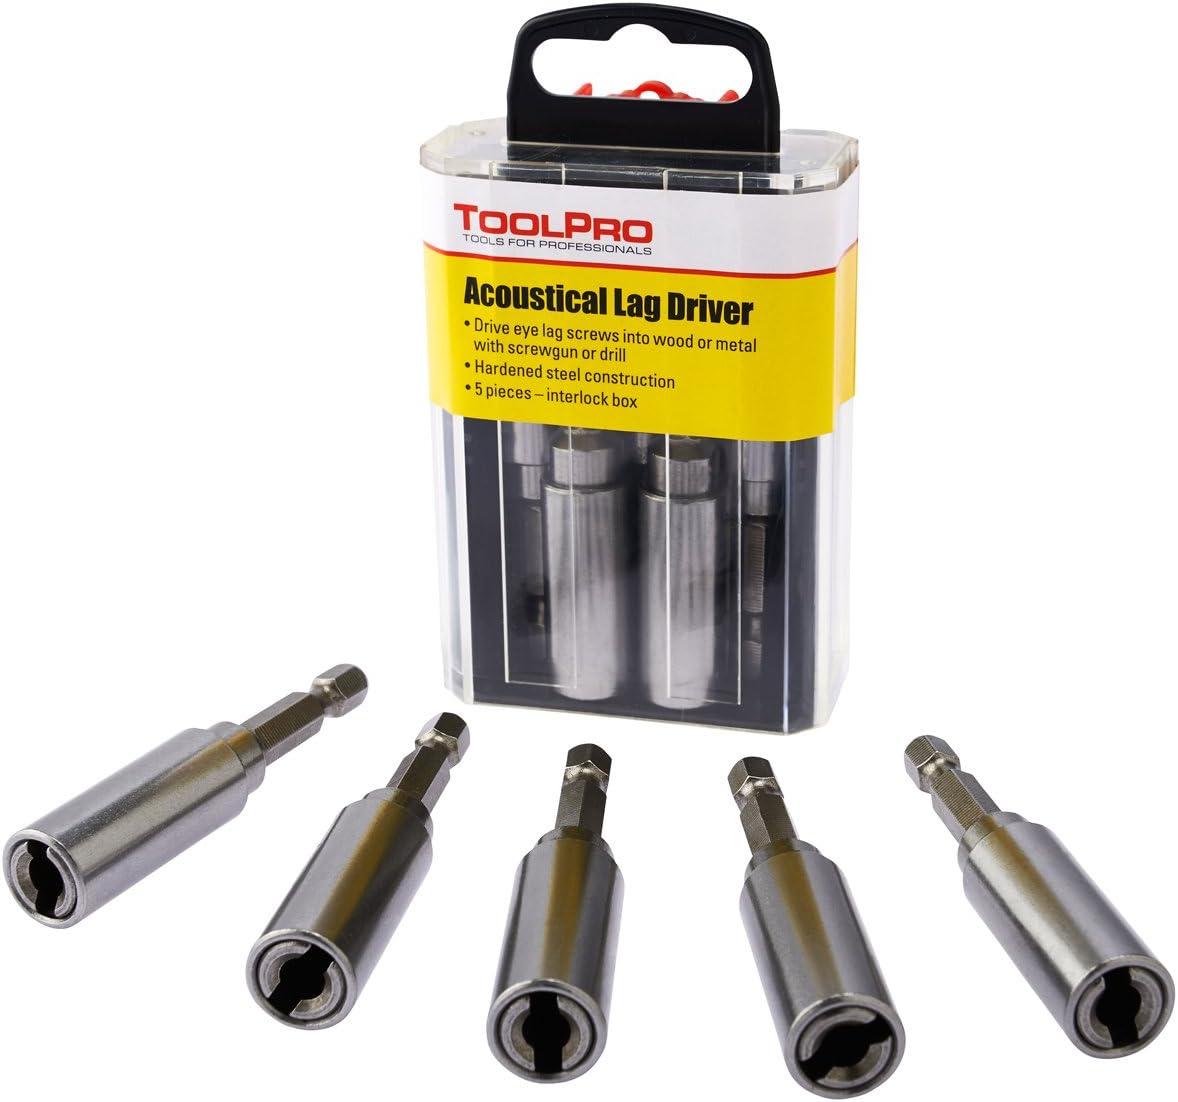 ToolPro Eye Lag Driver in Interlocking Storage Box 5 Pack